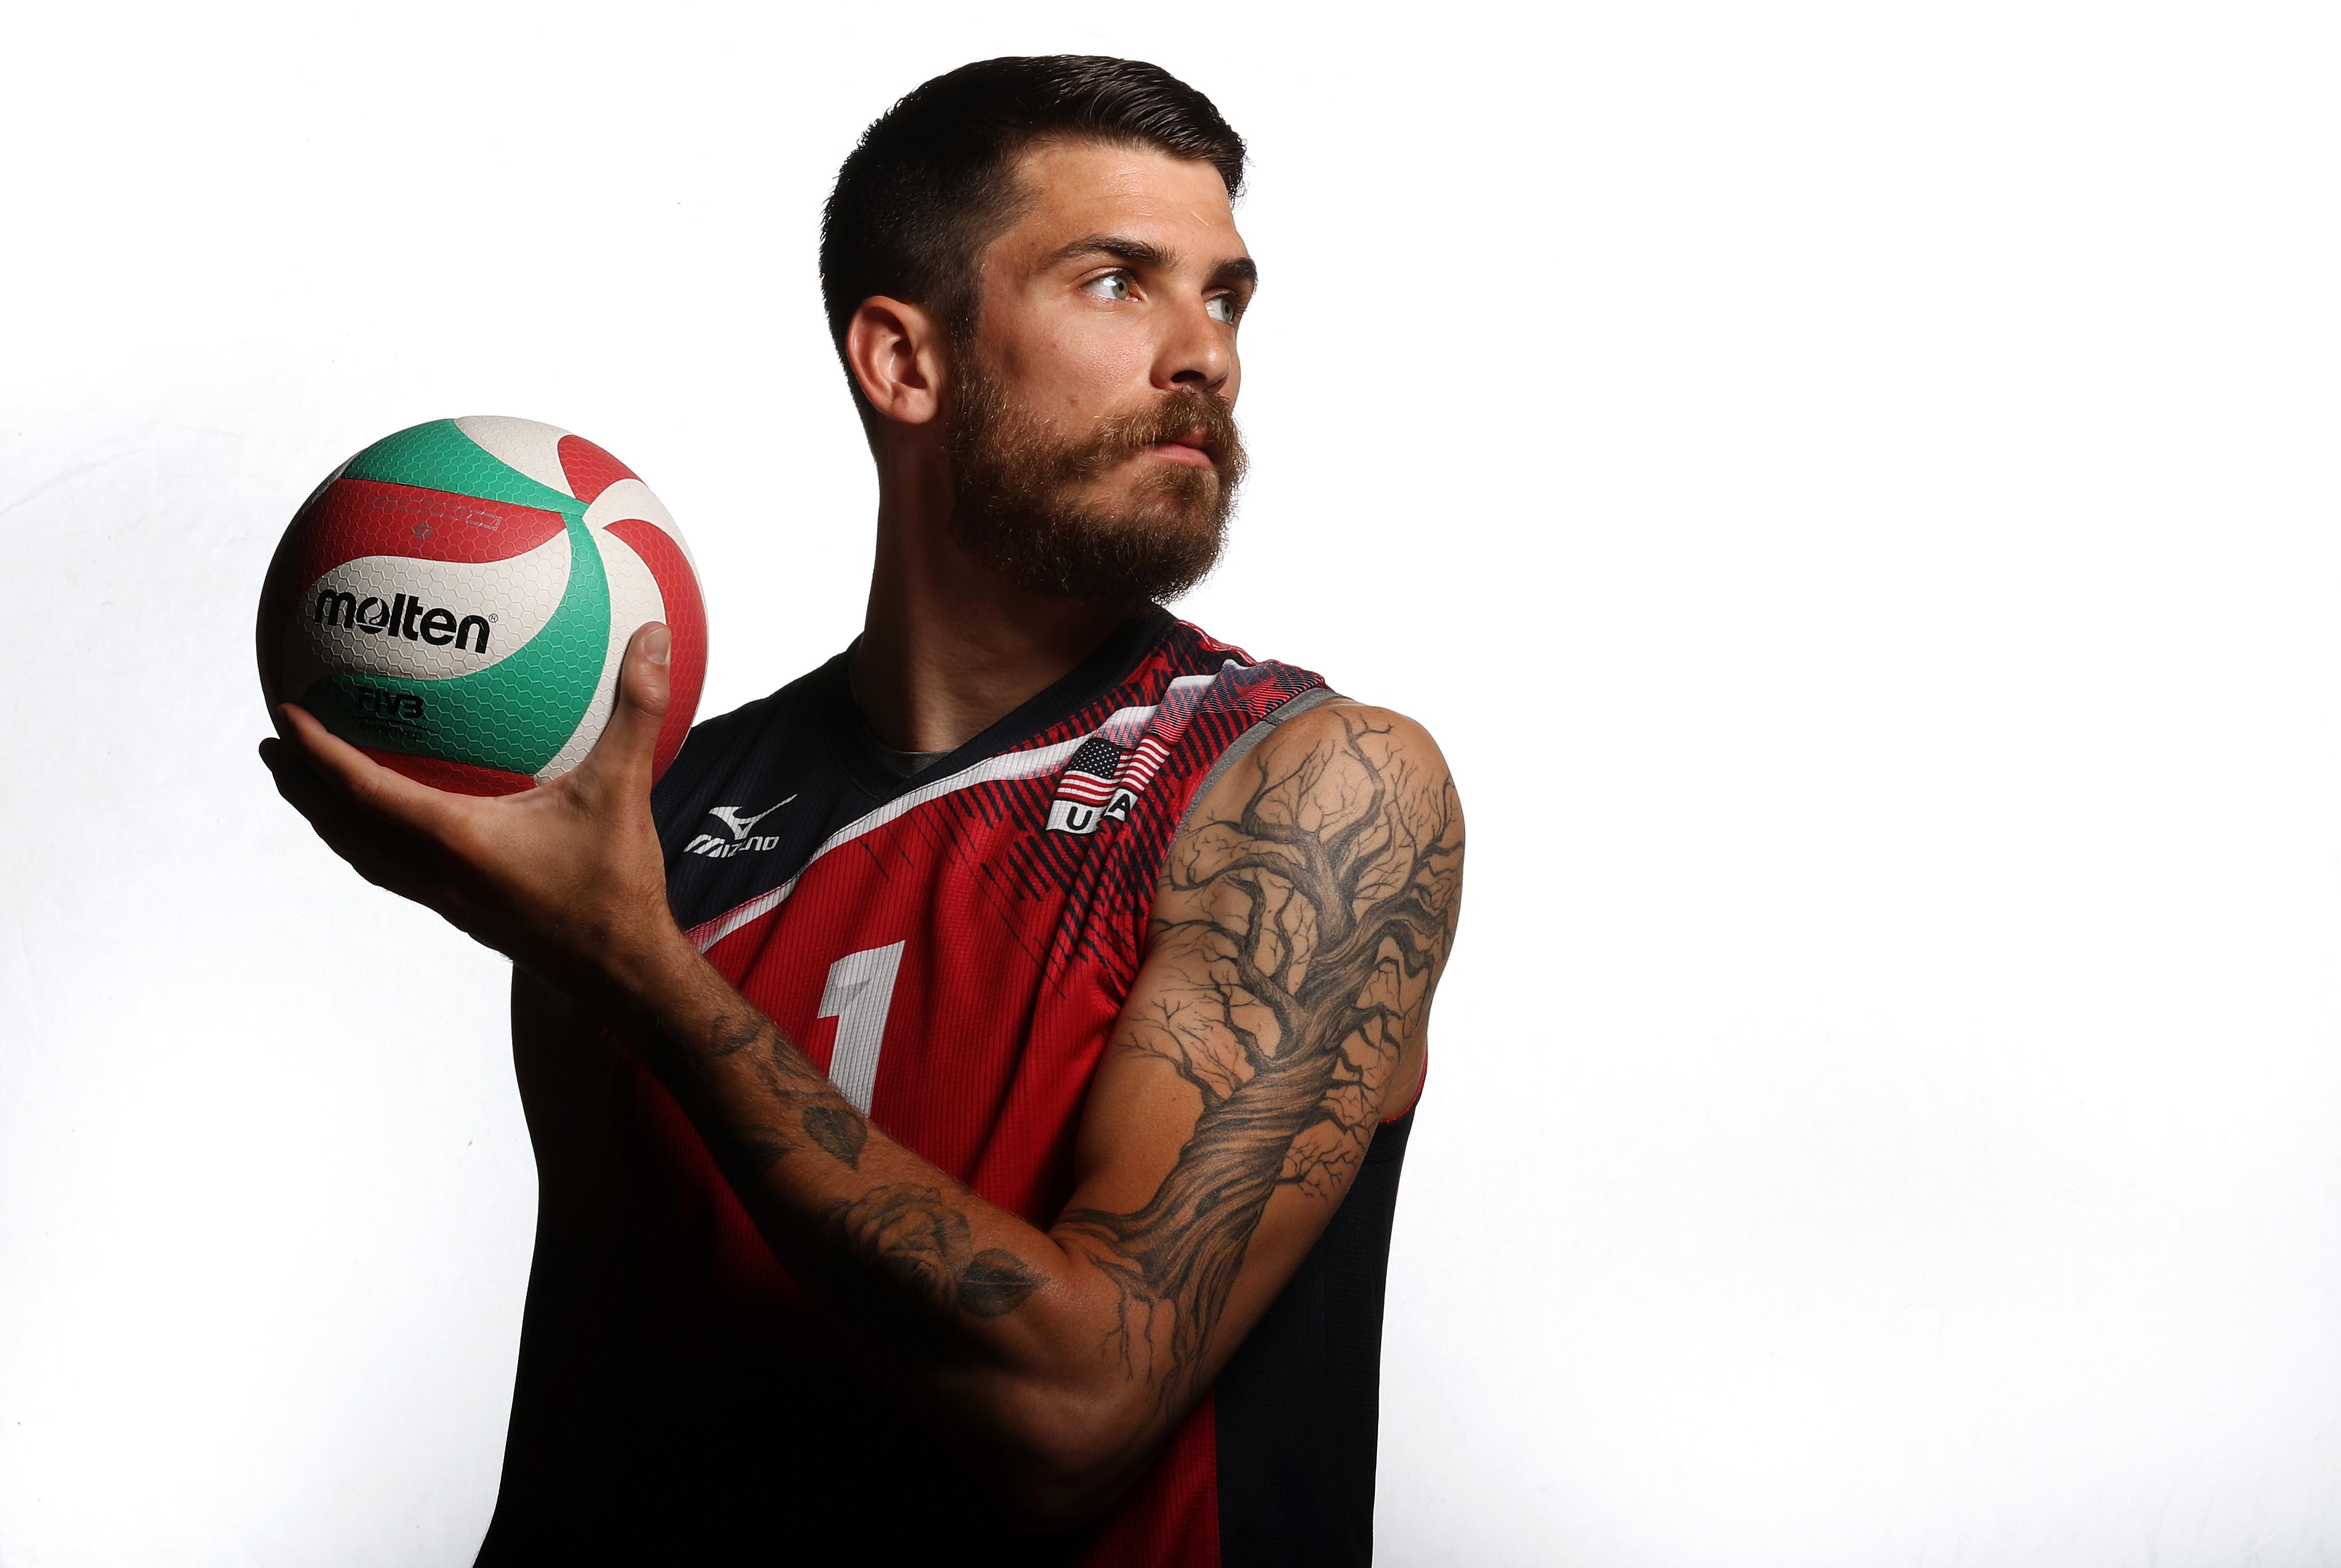 USA Indoor Volleyball Portrait Shoot